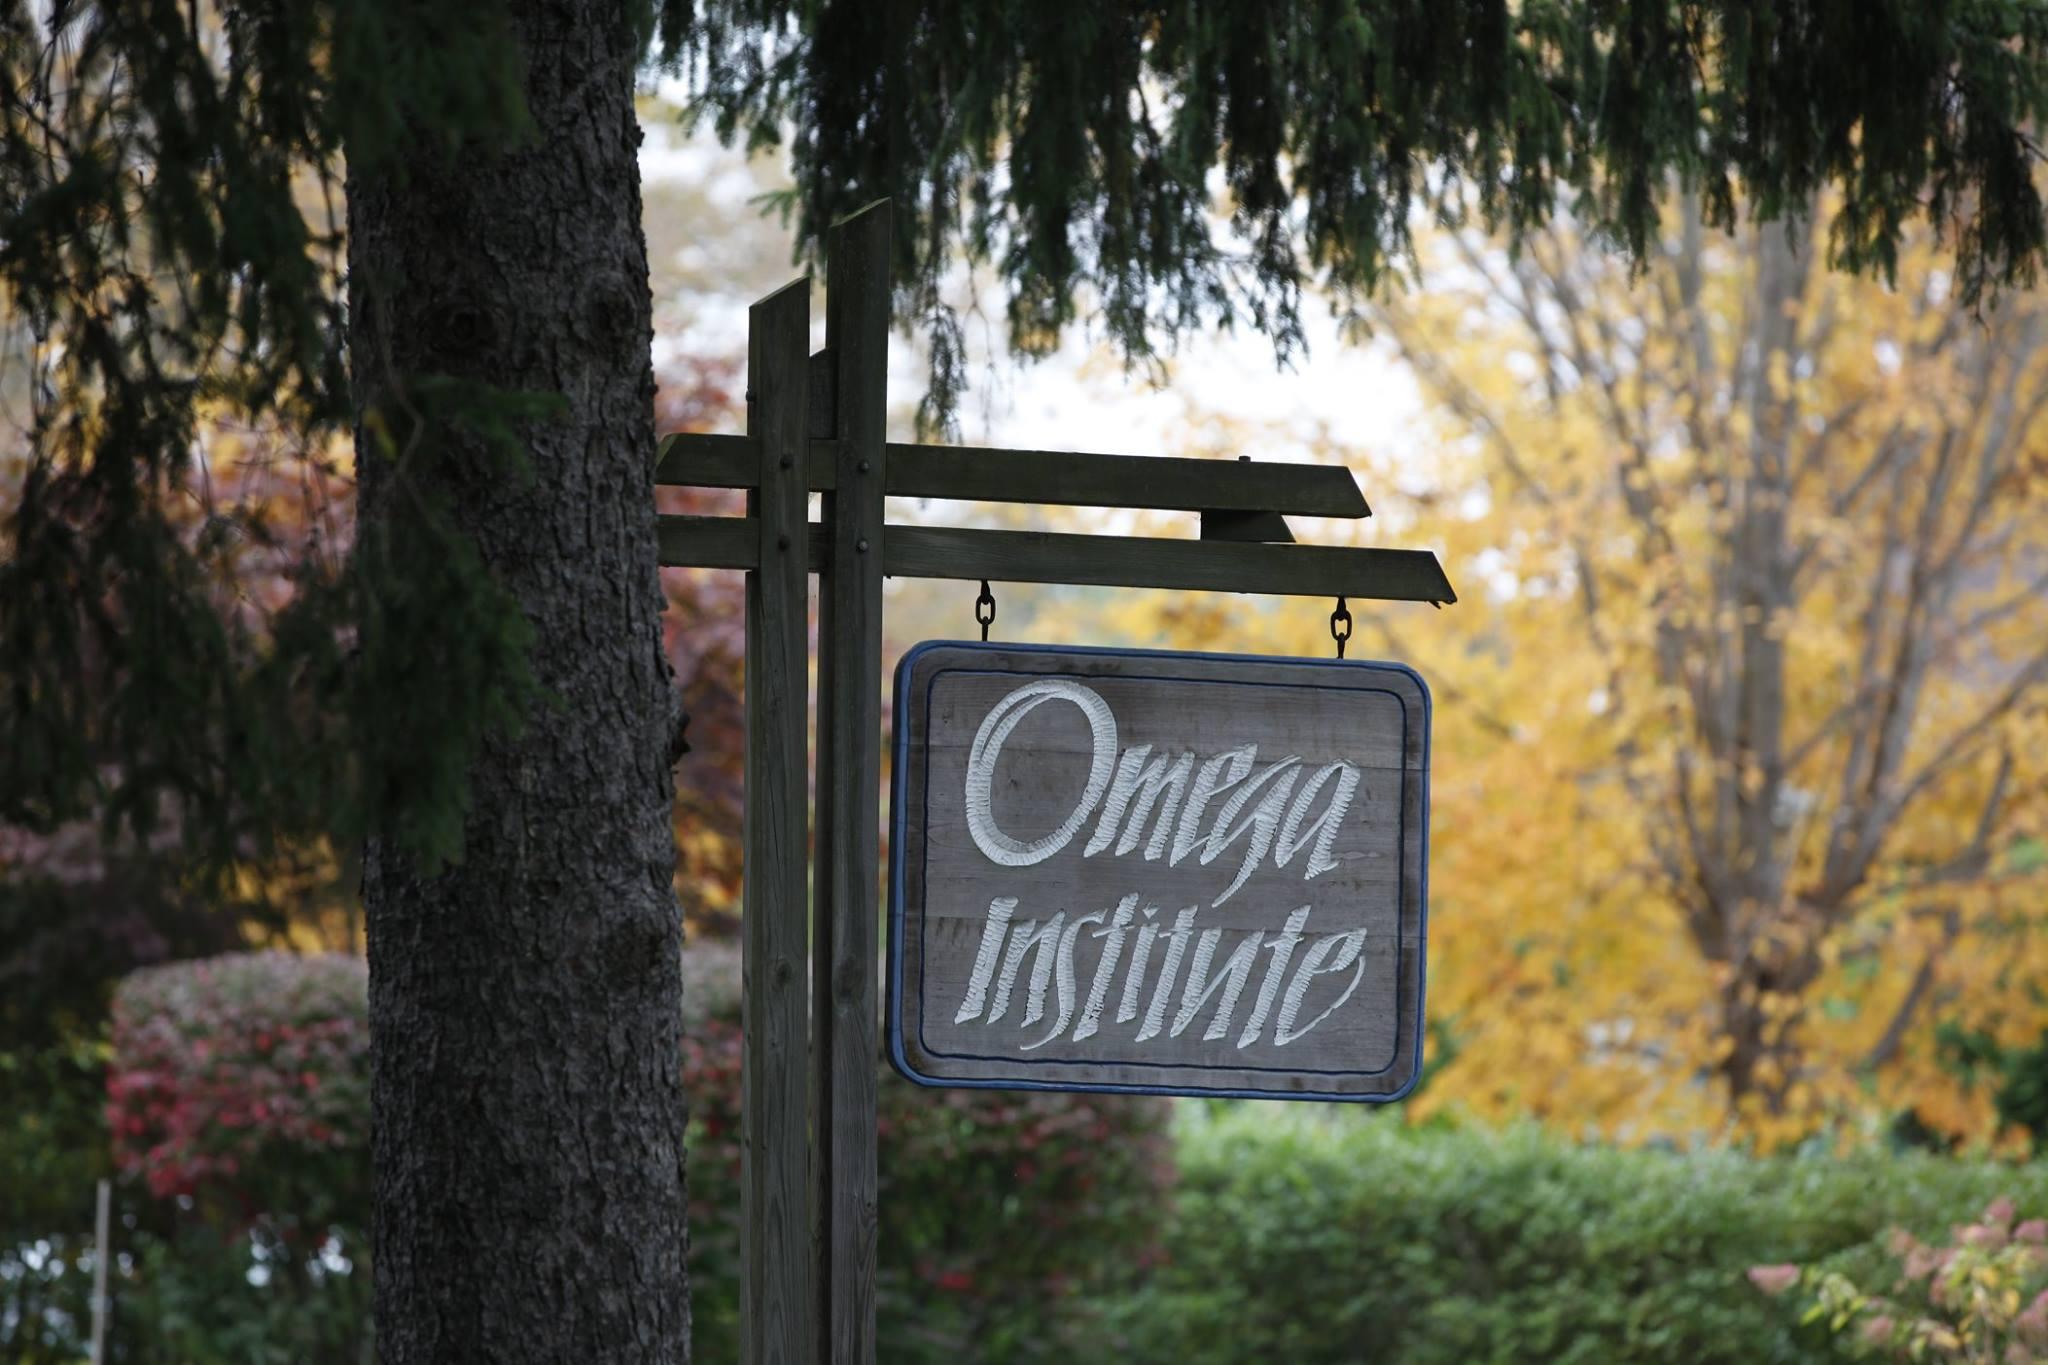 Omega Institute: Winds of Spirit